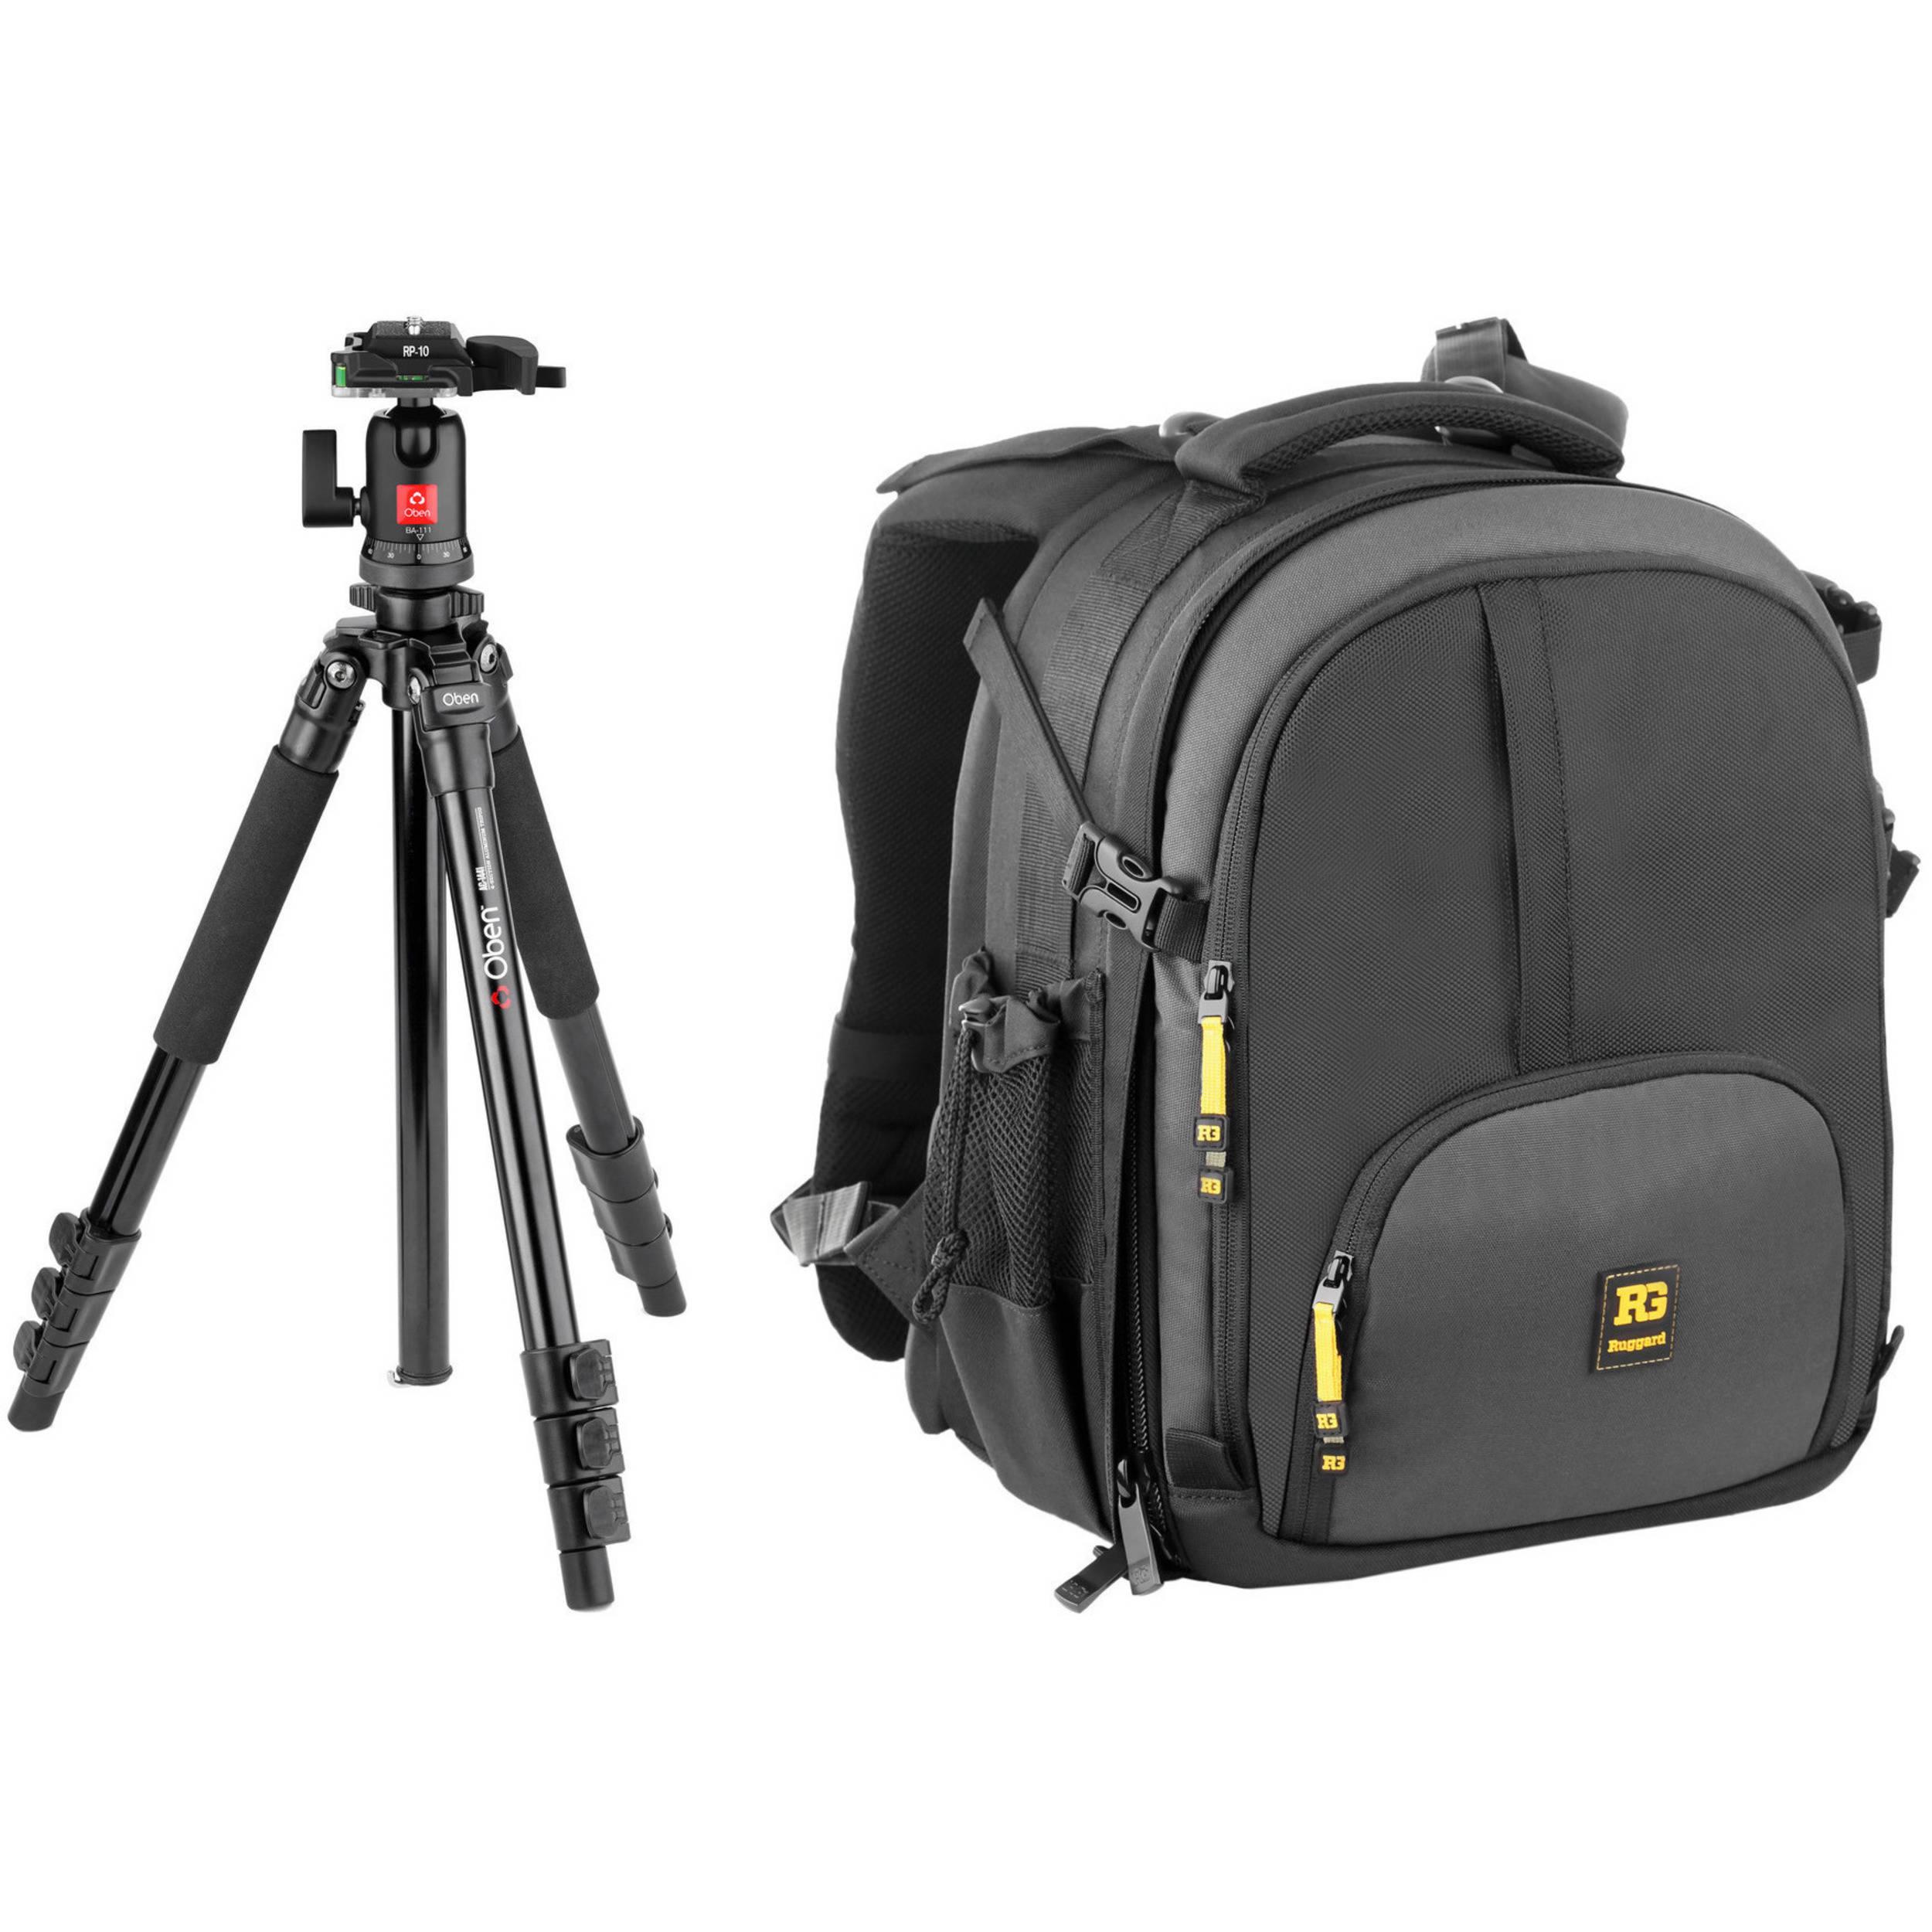 Https C Product 1307101 Reg Fujifilm Mirrorless Camera X T20 1650 Bk Ruggard Thunderhead 35 Dslr 1309503